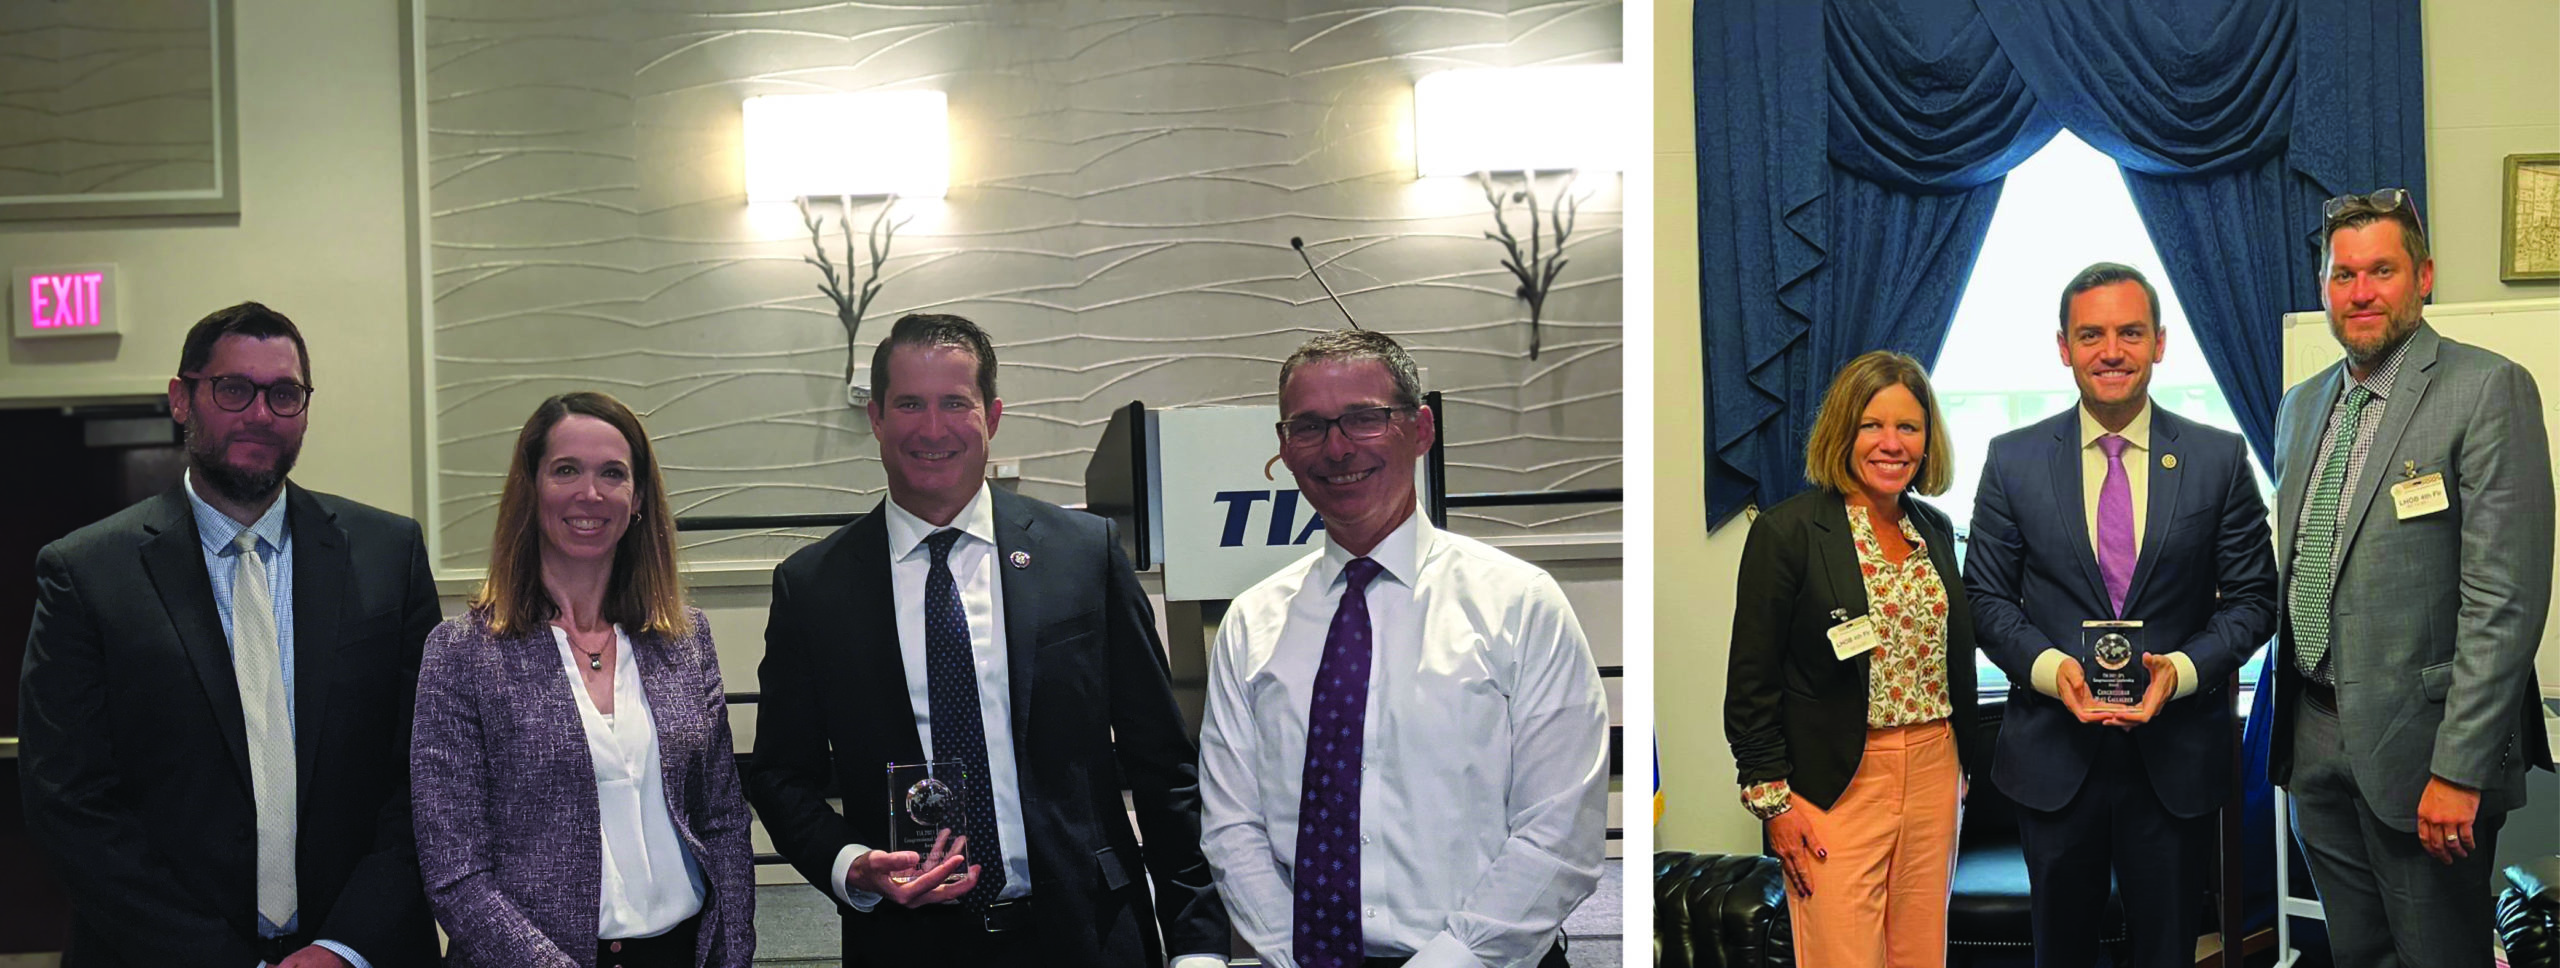 2021 Leadership Award Pics for Website